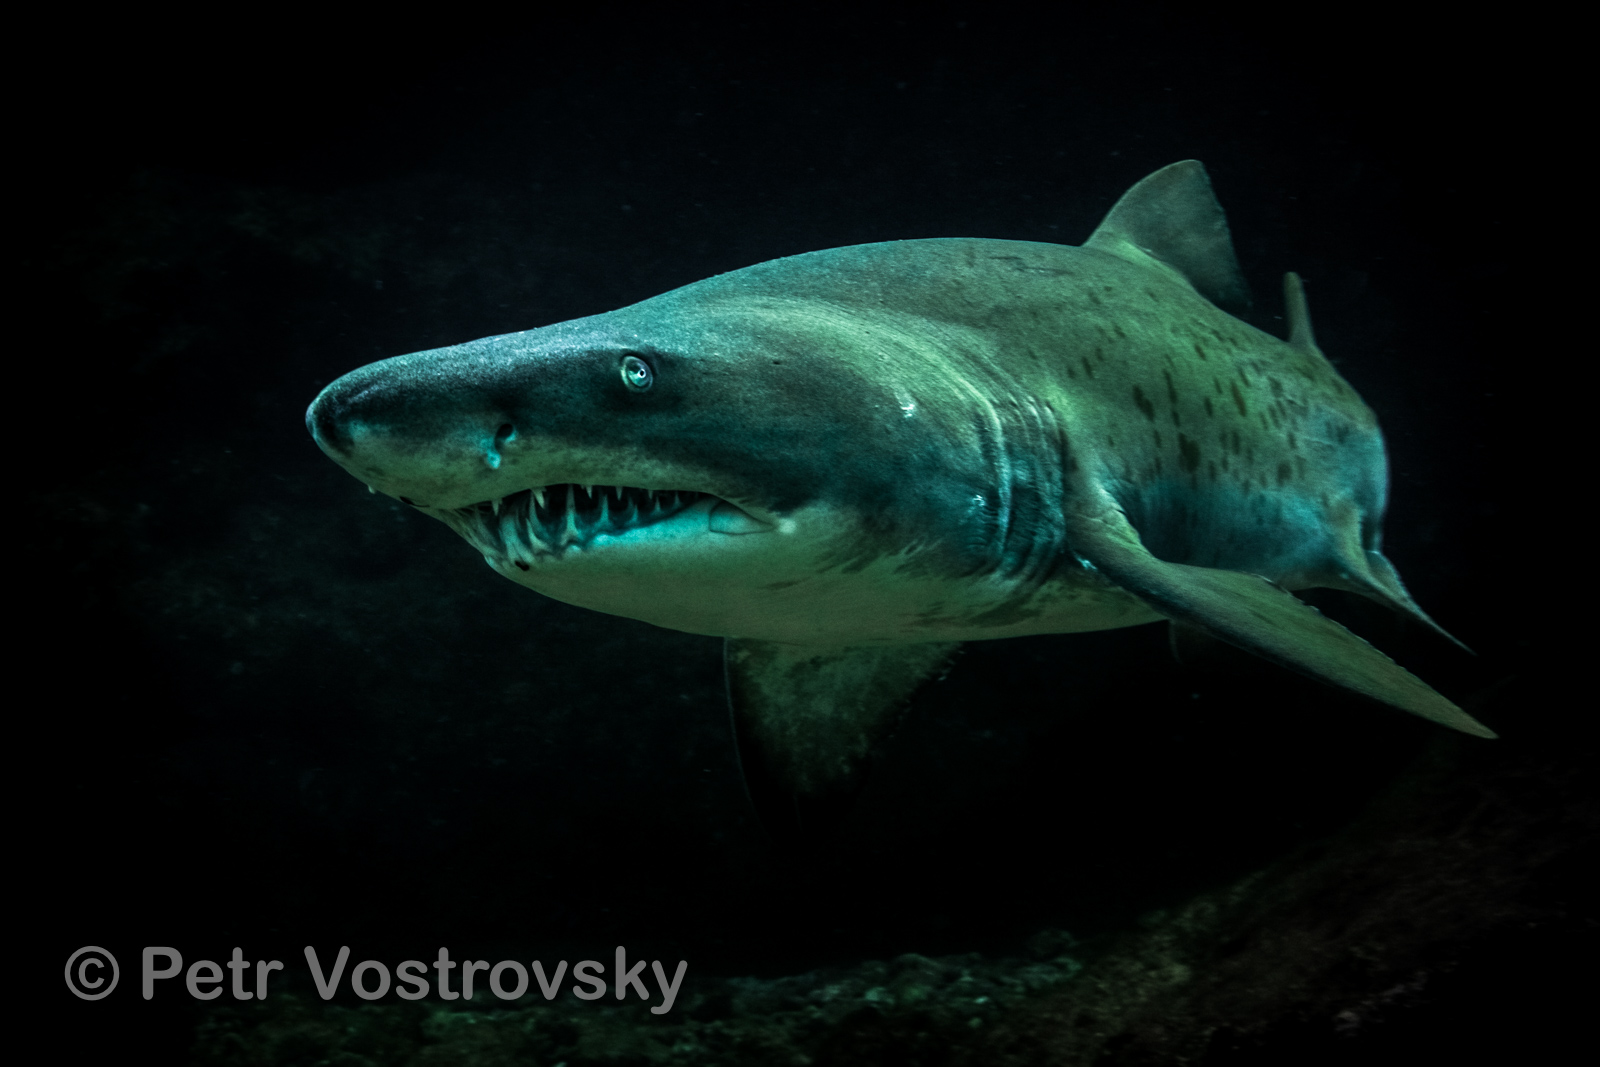 Žralok písečný. Jihoafrická republika, Aliwal Shoal